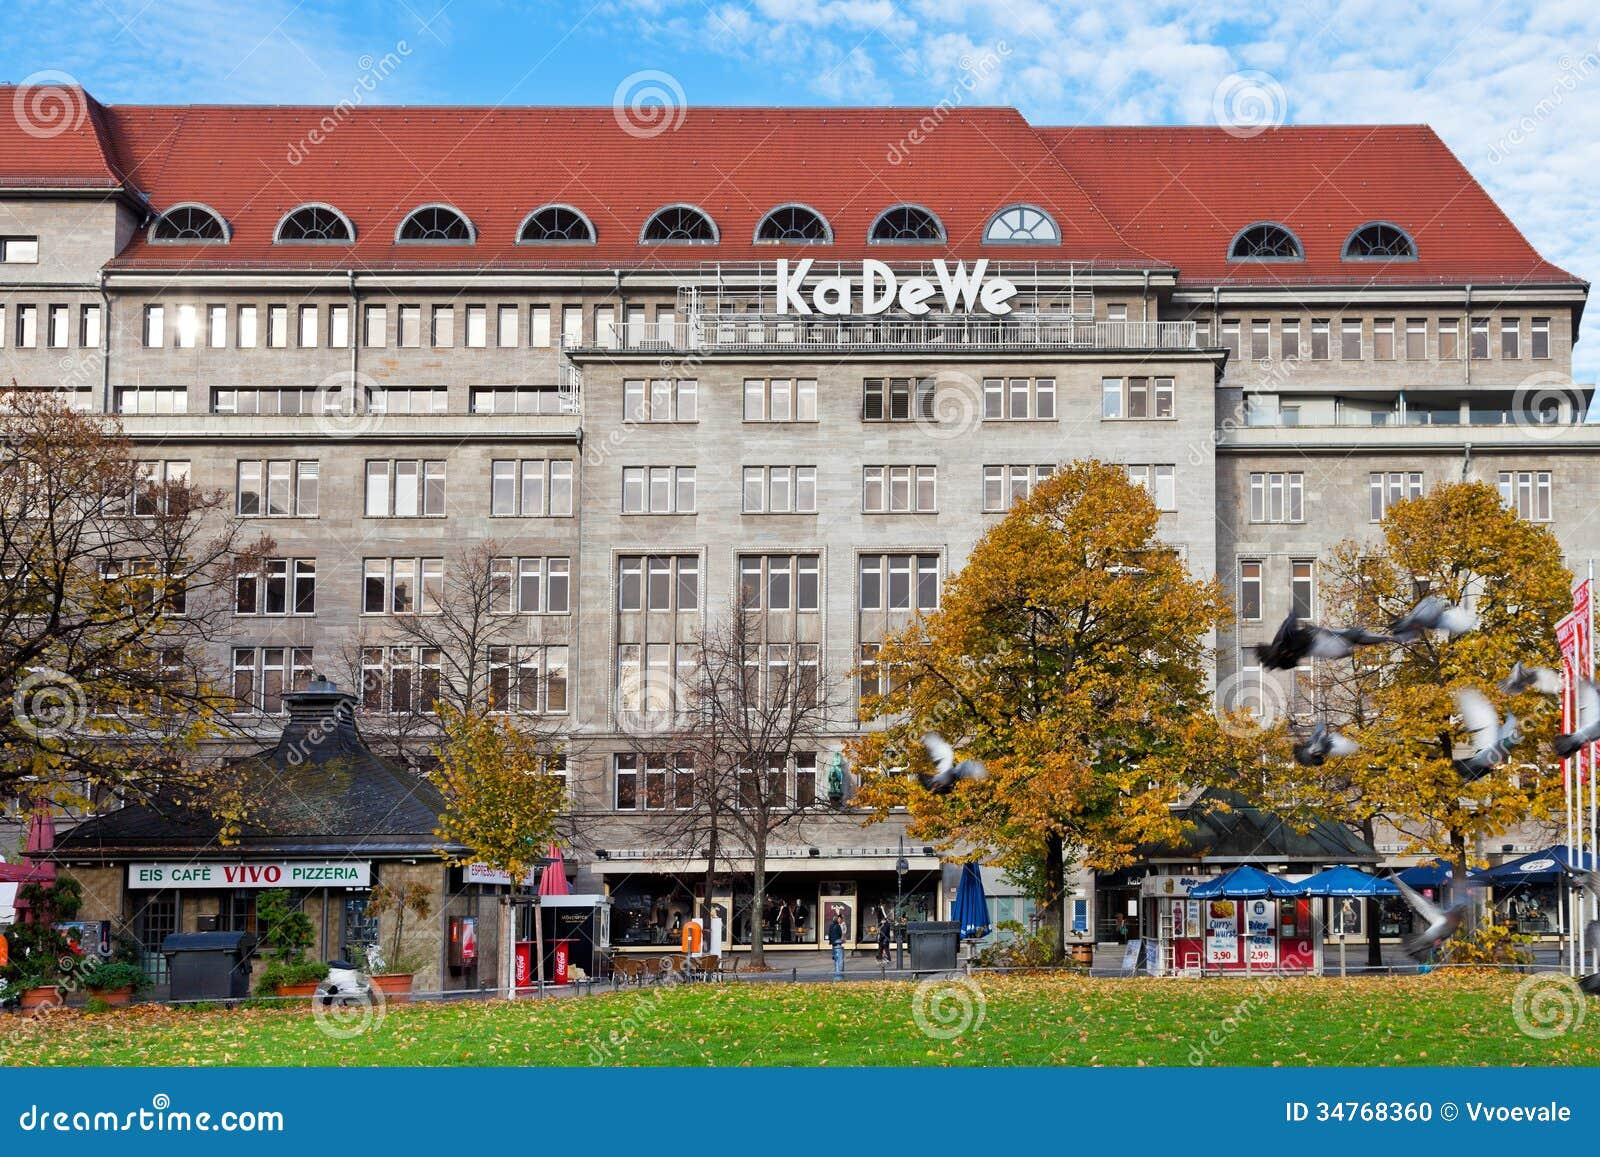 entrance in kadewe from wittenbergplatz in berlin editorial image image 34768360. Black Bedroom Furniture Sets. Home Design Ideas